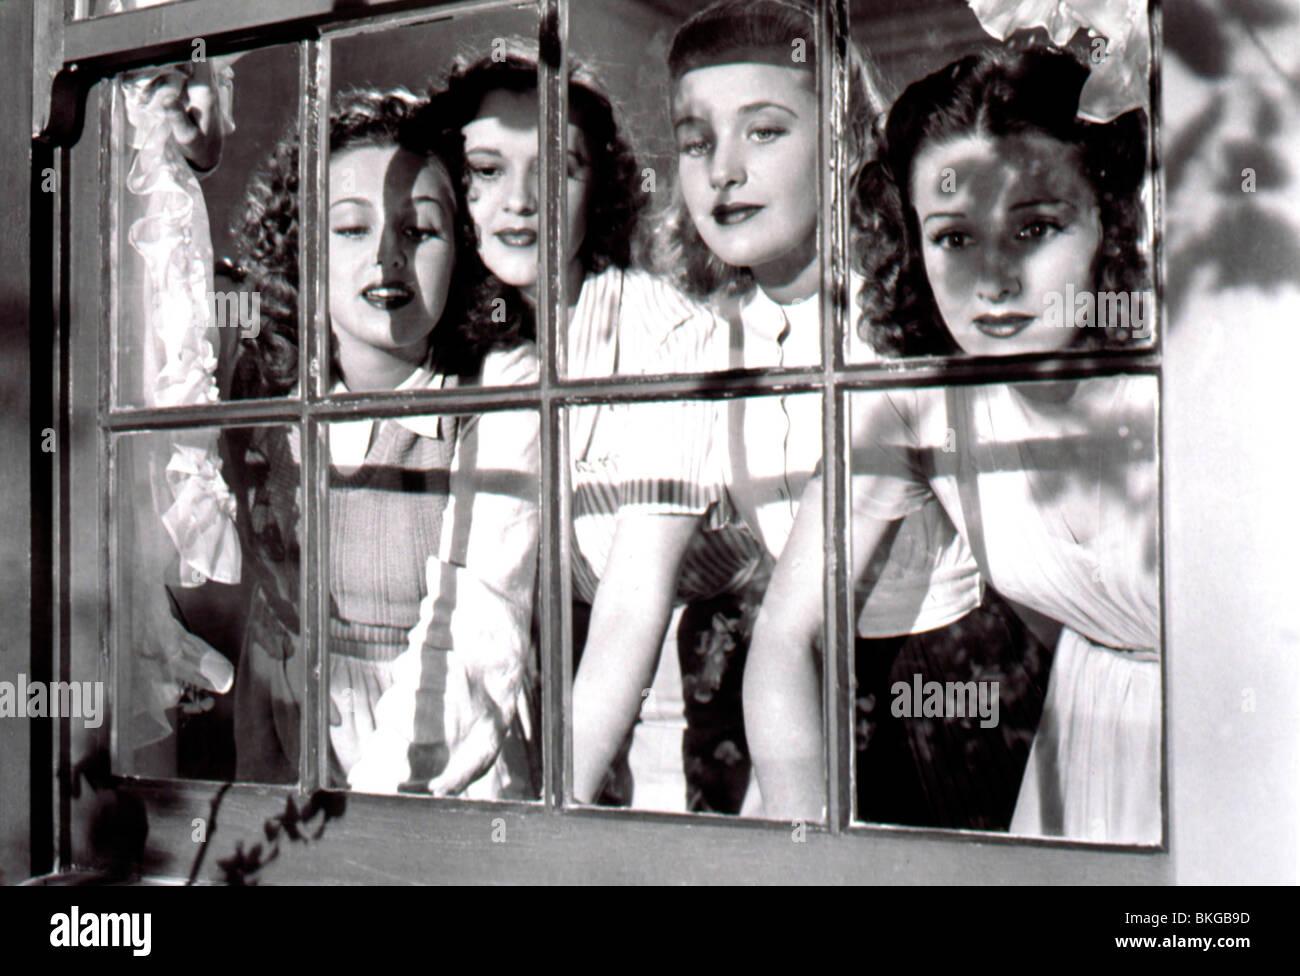 Petra Nemcova,Elise Guilbault XXX archive Grace Park,Shobhana